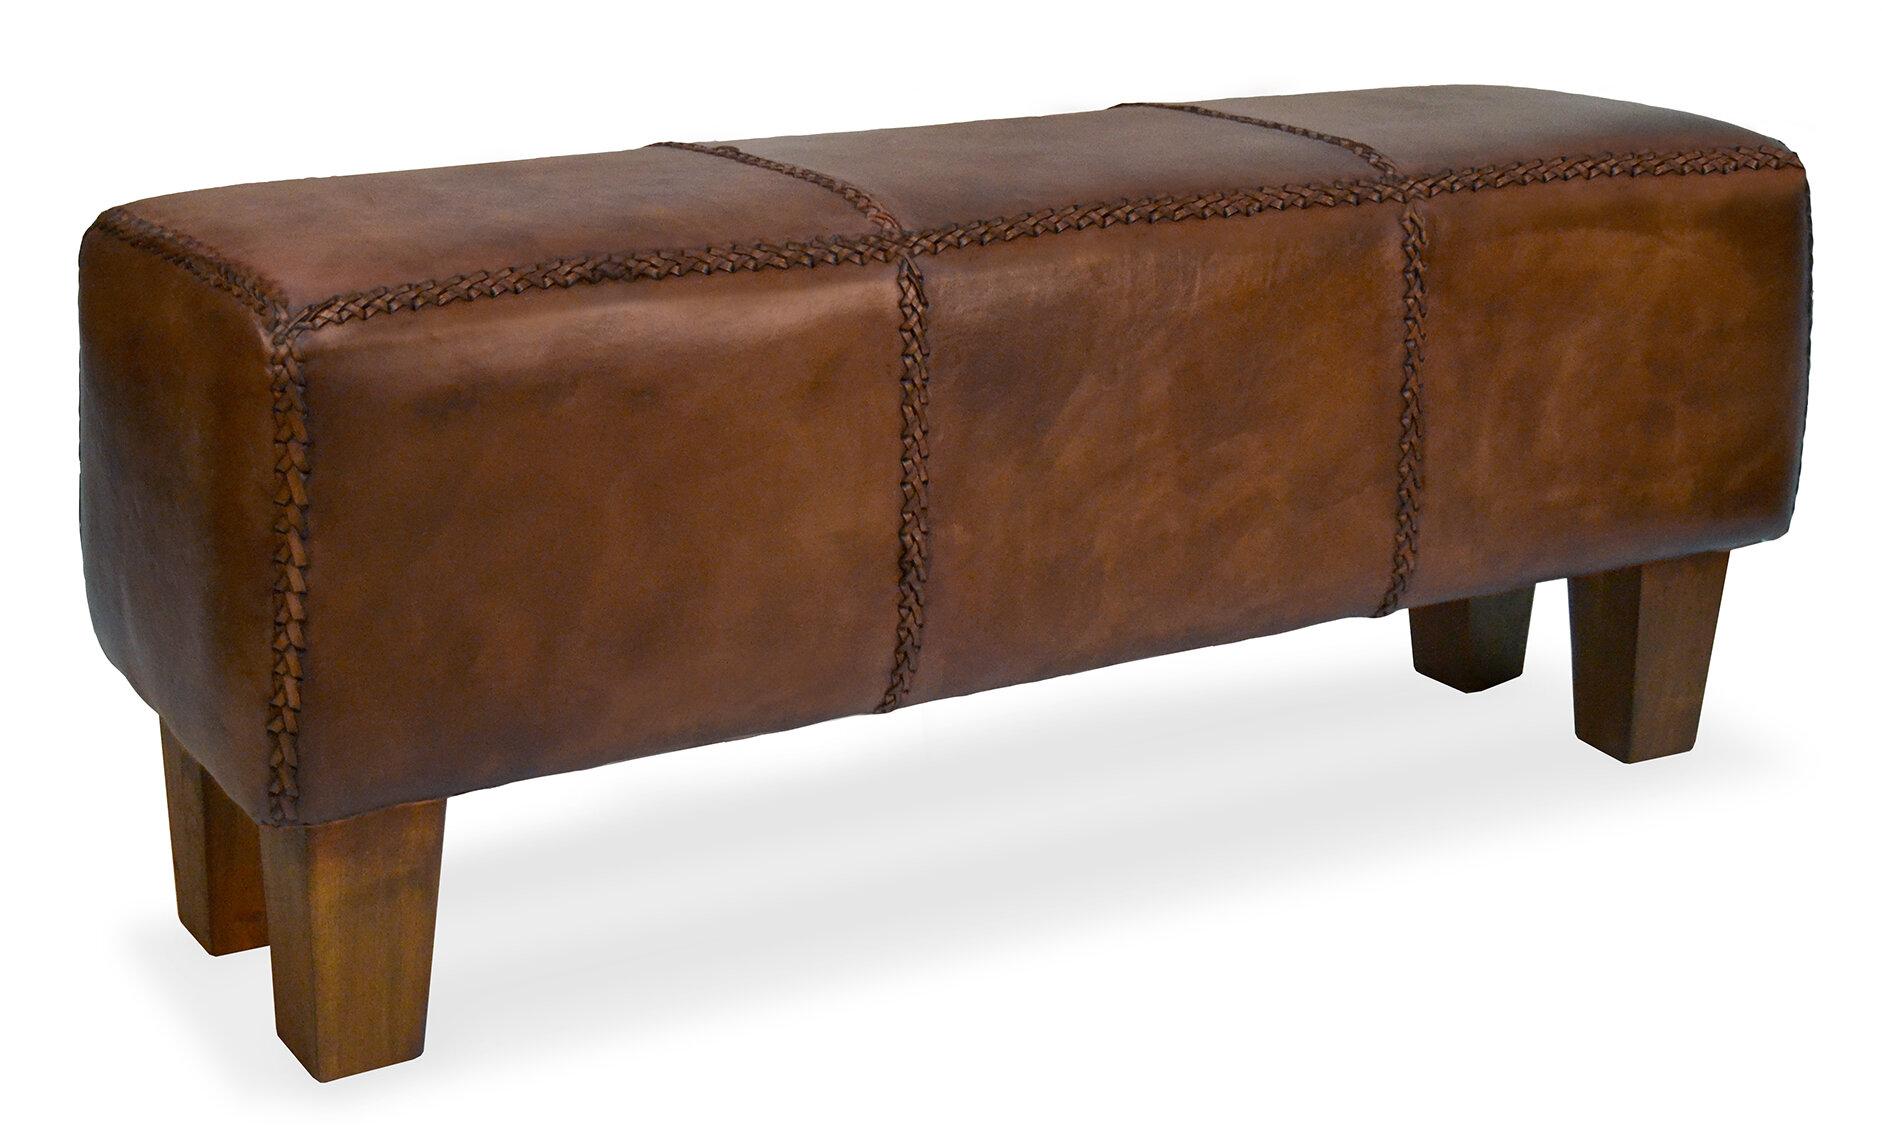 Braid Bedroom Bench